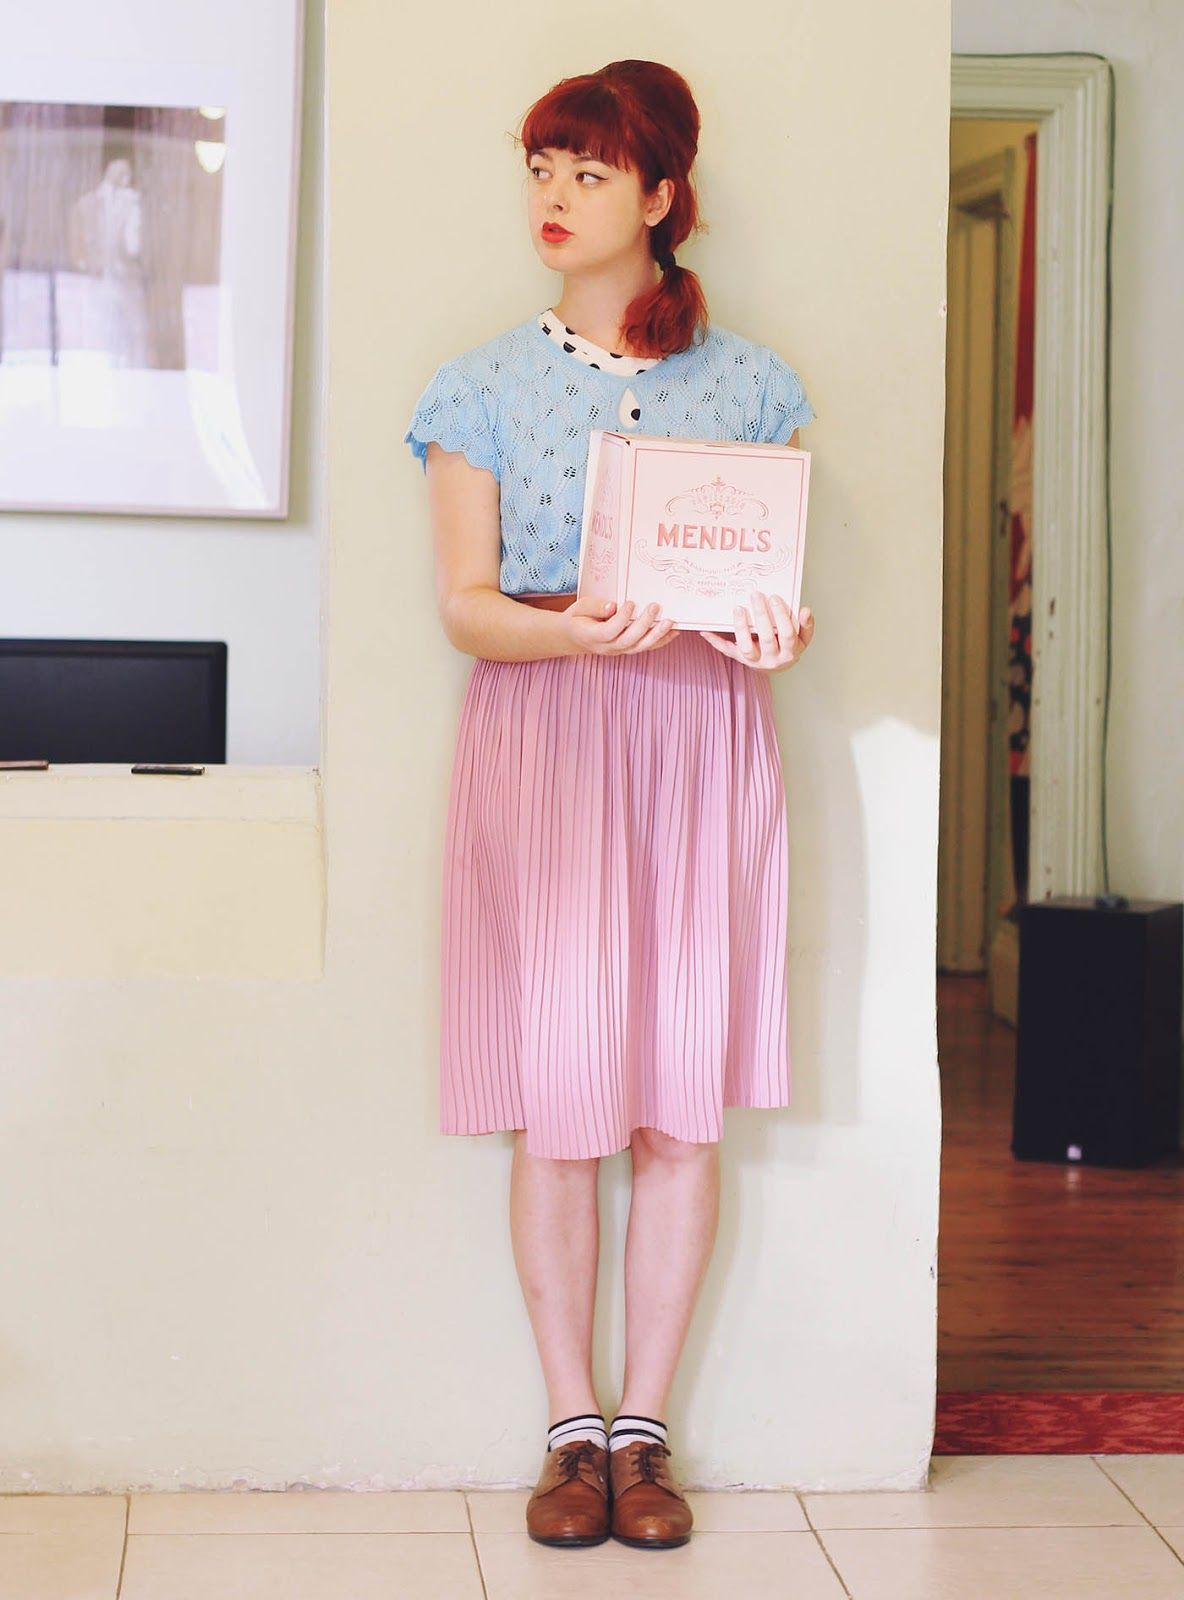 Blog Diy Couture Déco Vintage Tuto Couture Do It Yourself